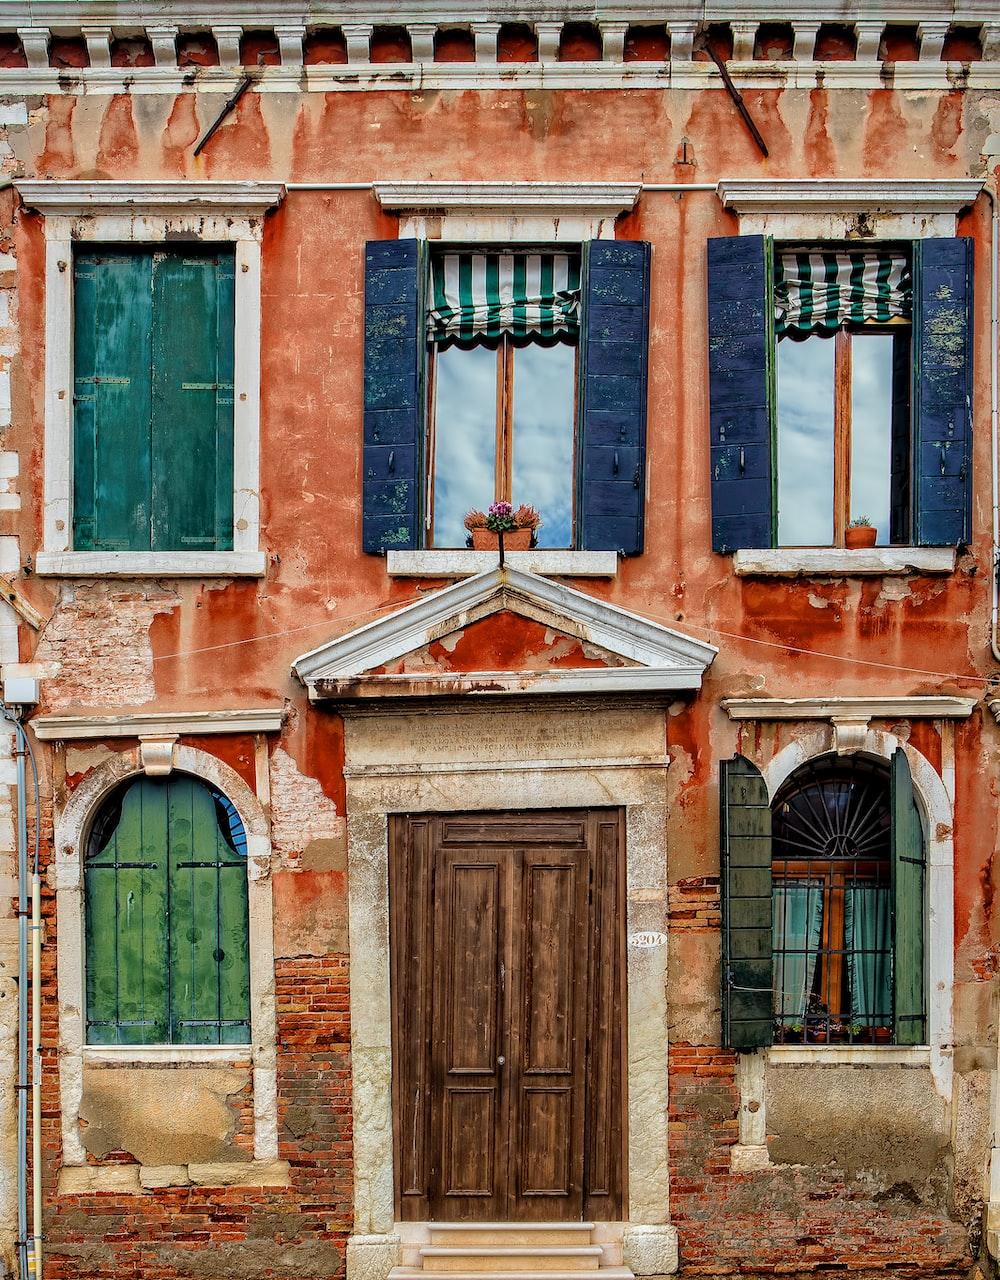 orange painted building facade